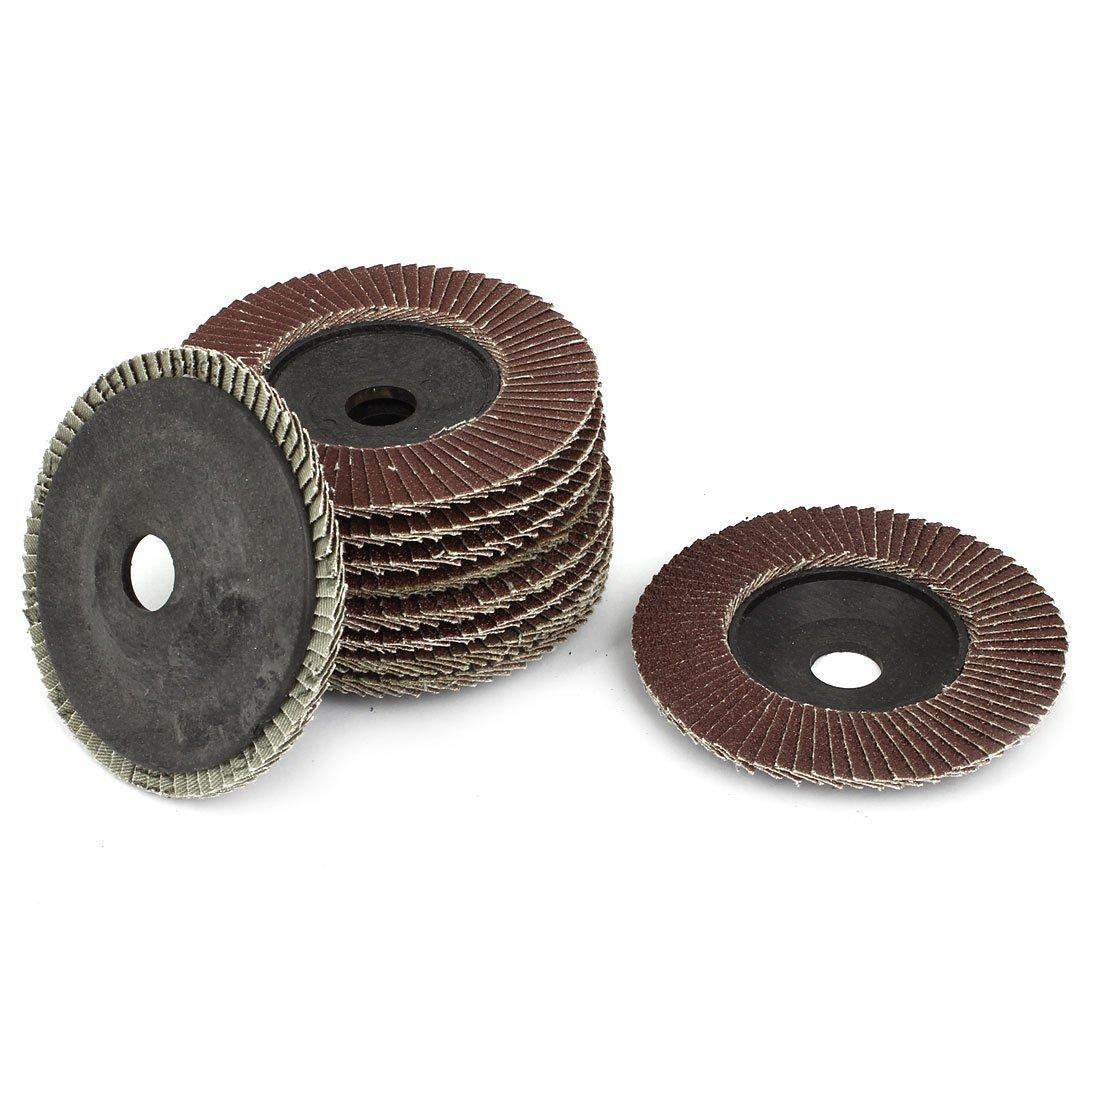 RilexAwhile 4-inch x 5//8-inch Sanding Flap Disc Grinding Wheel 320 Grit 10 Pcs